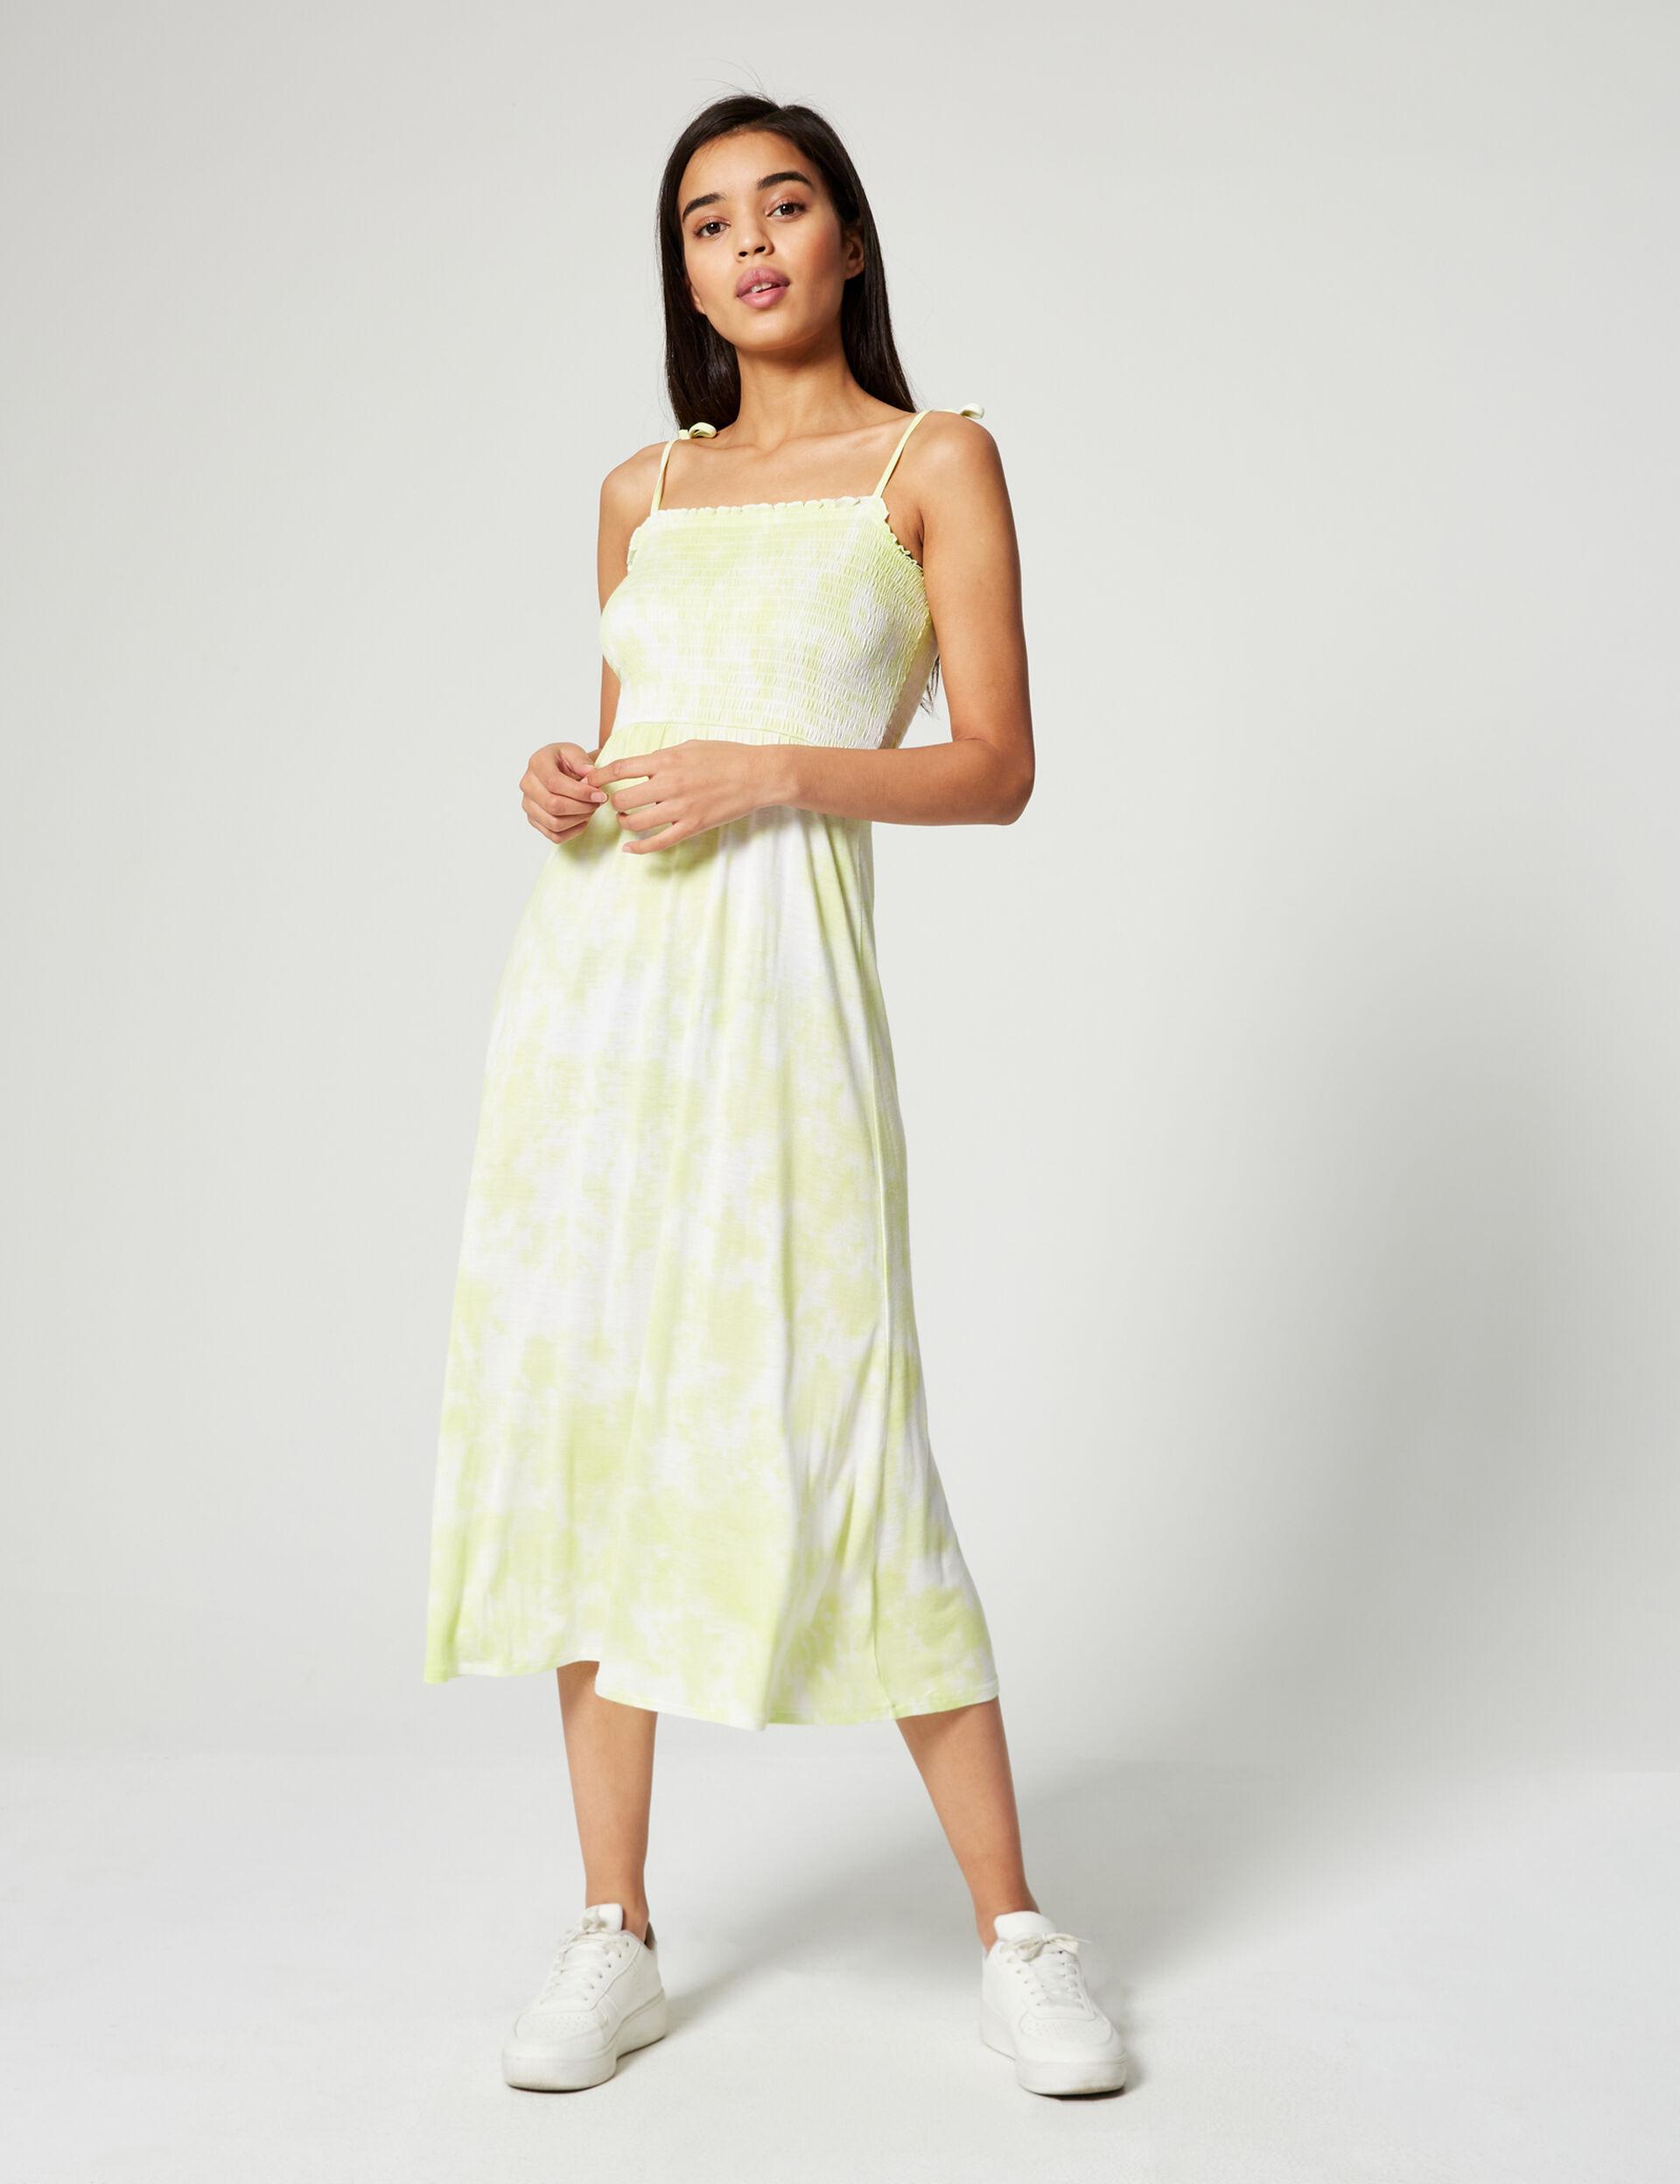 Patterned smock dress